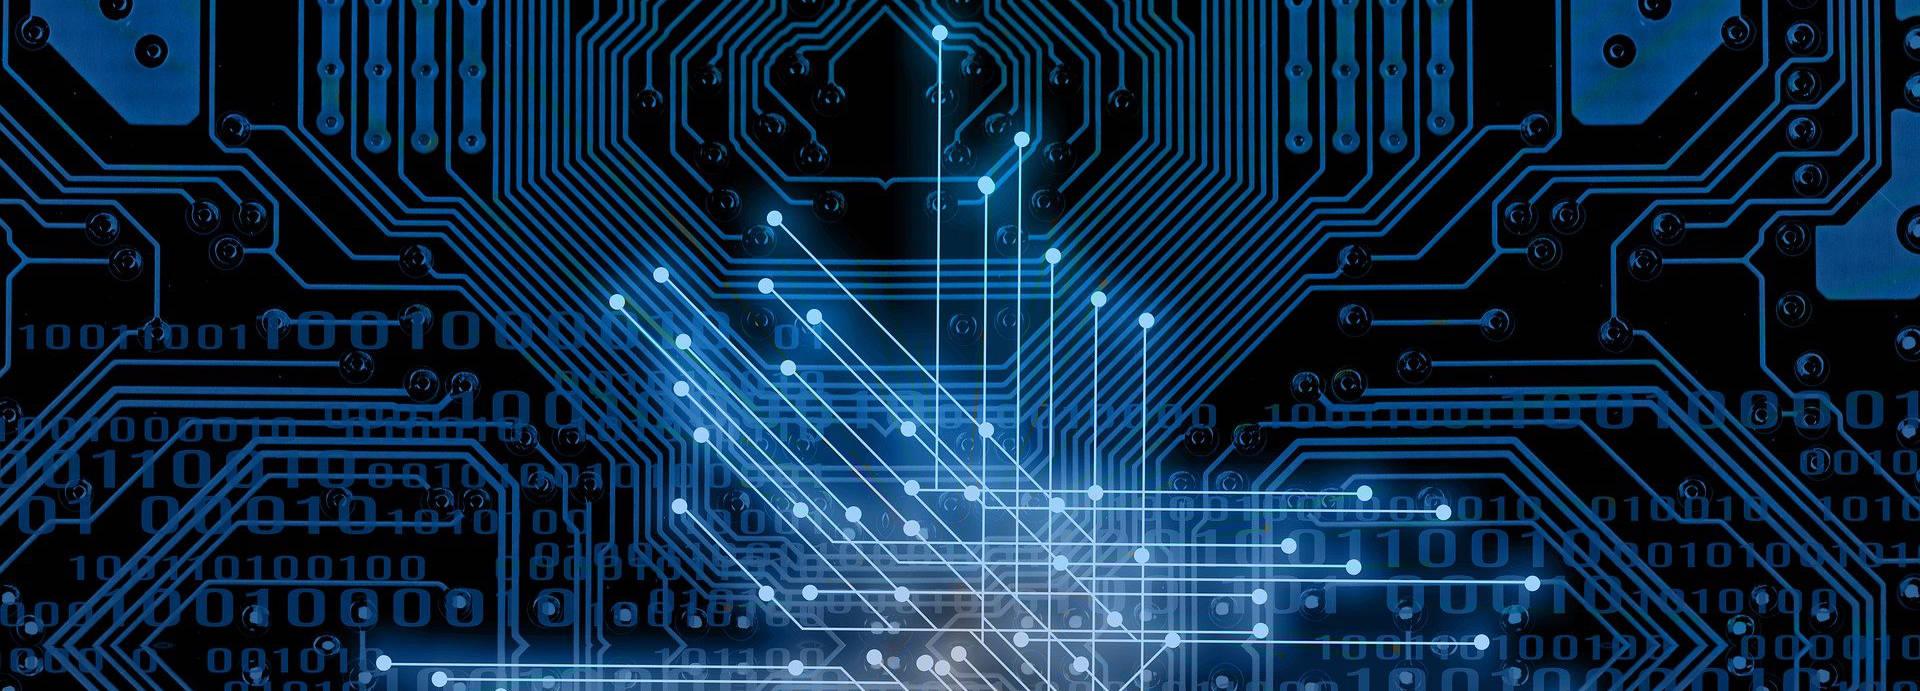 Schritt 2: digitale Strukturen vernetzen